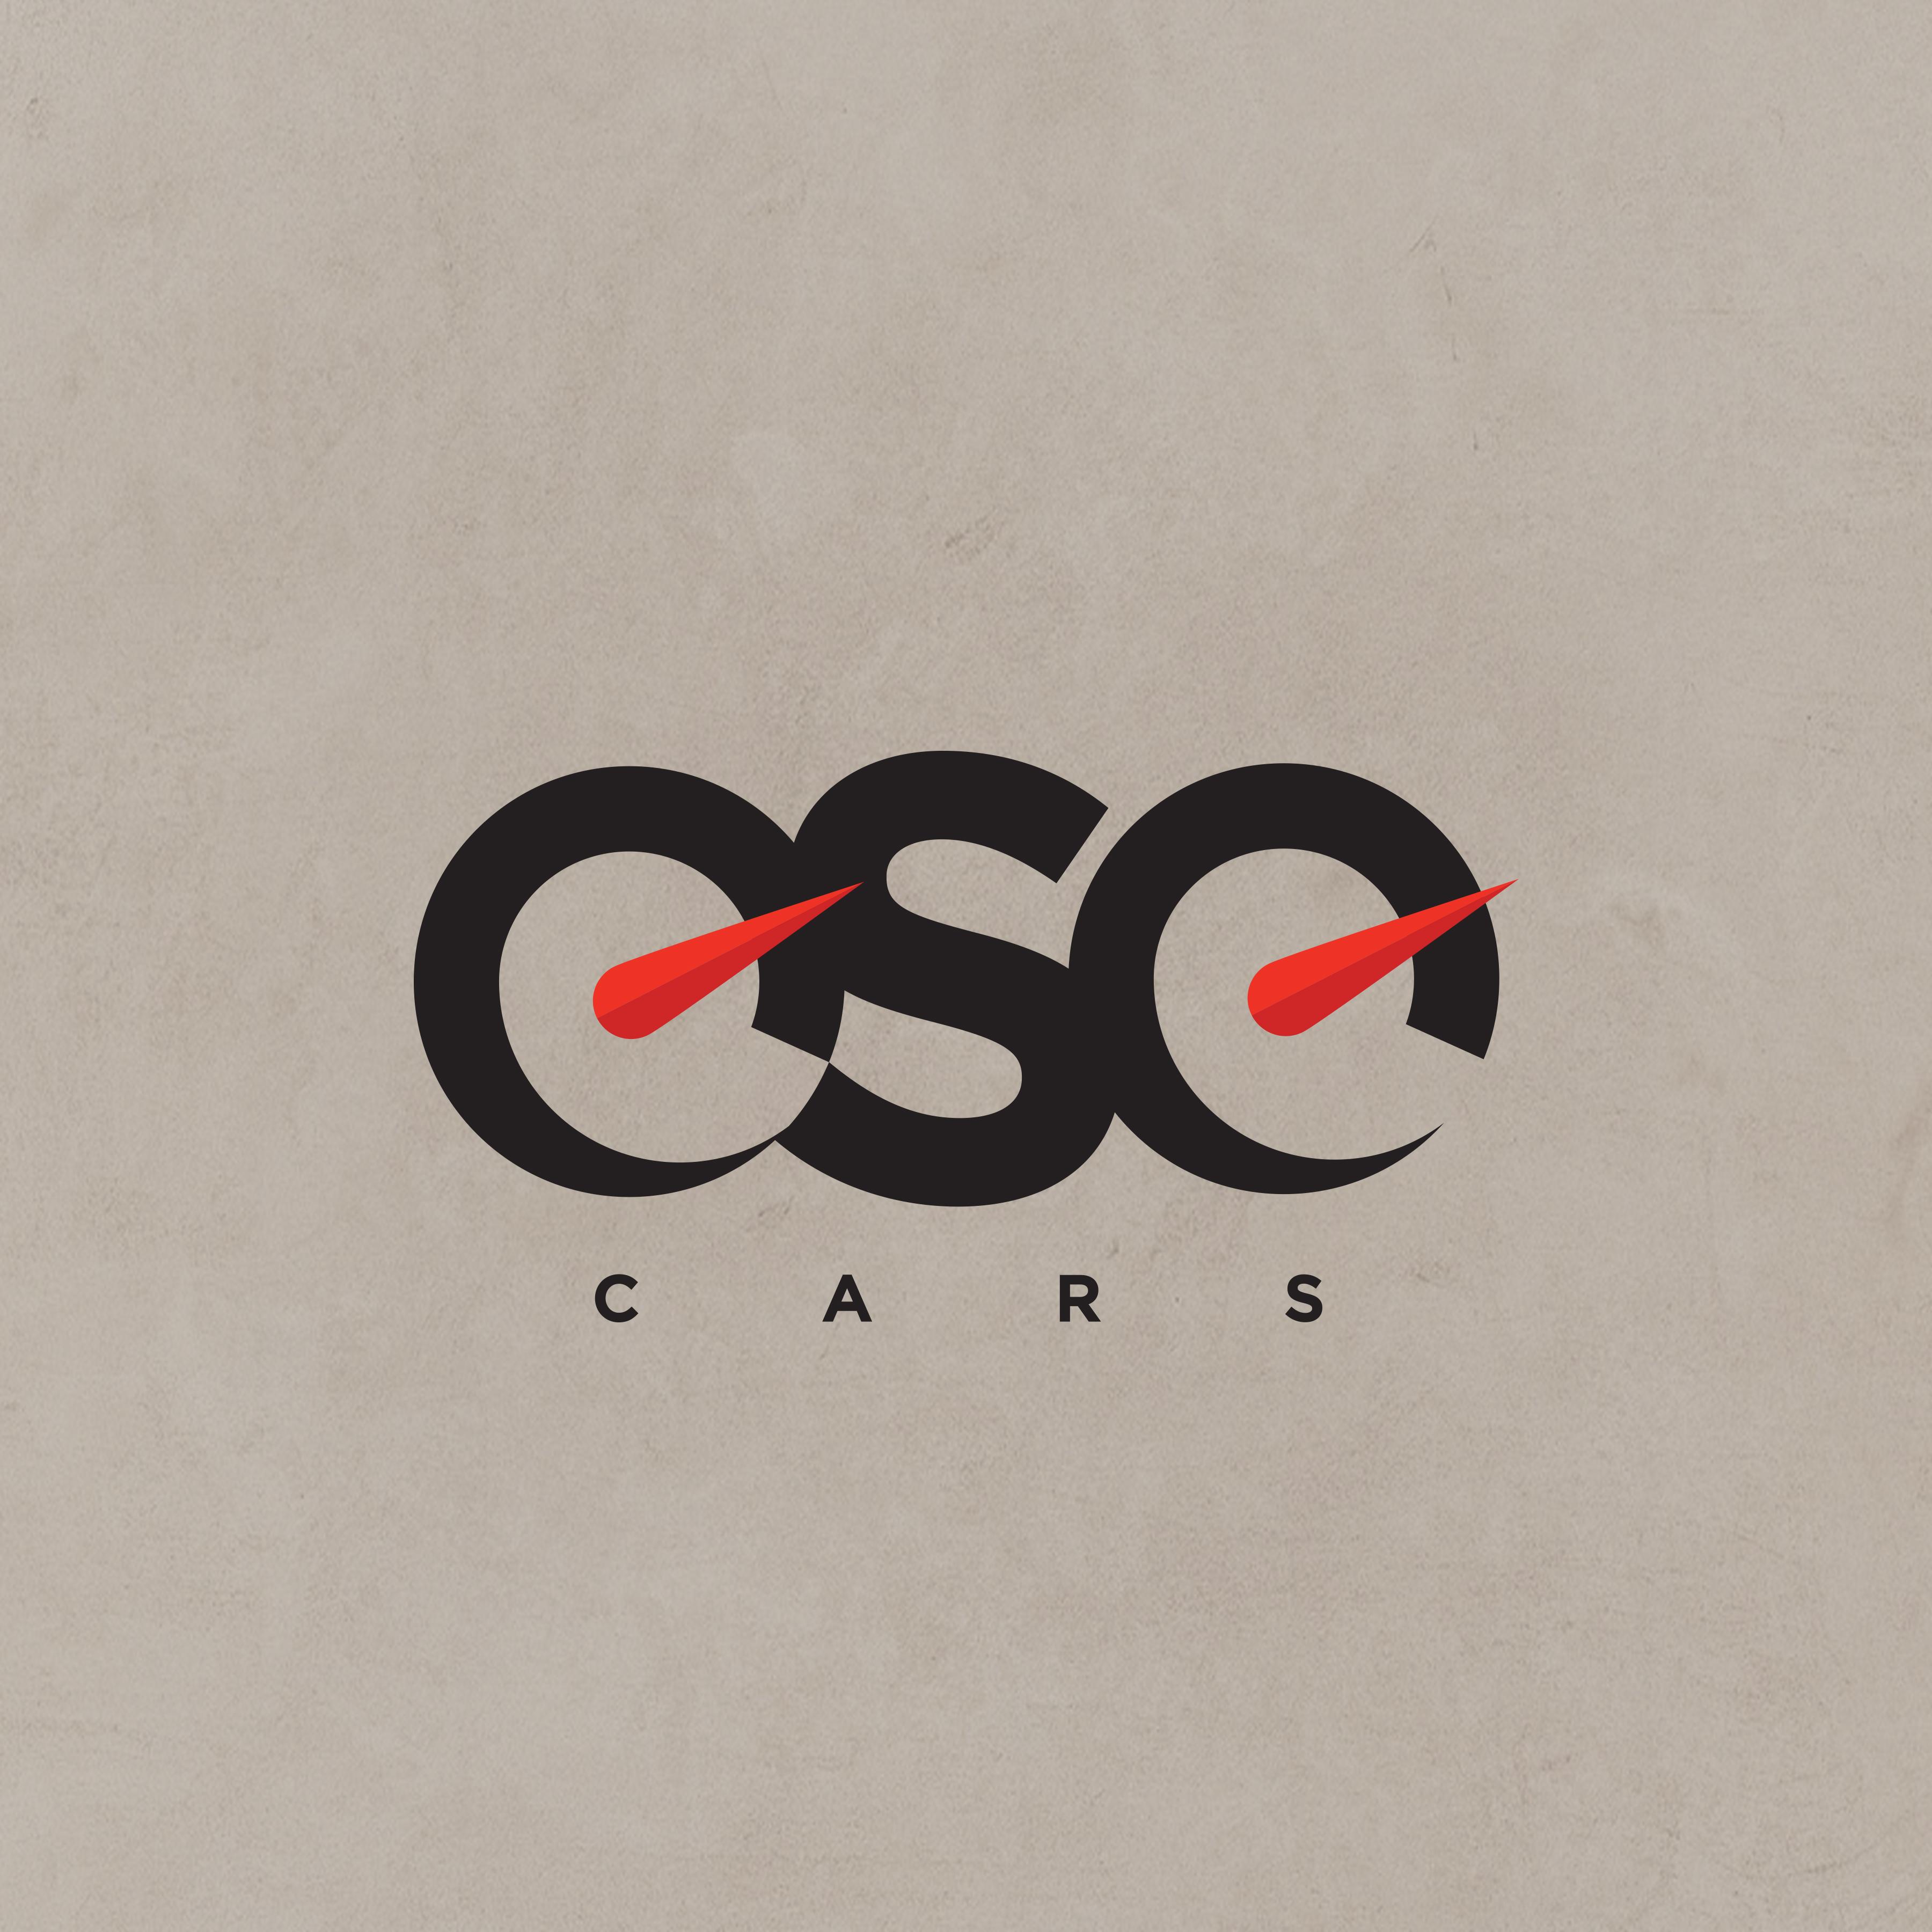 ANerdsWorld_Logos_Cars